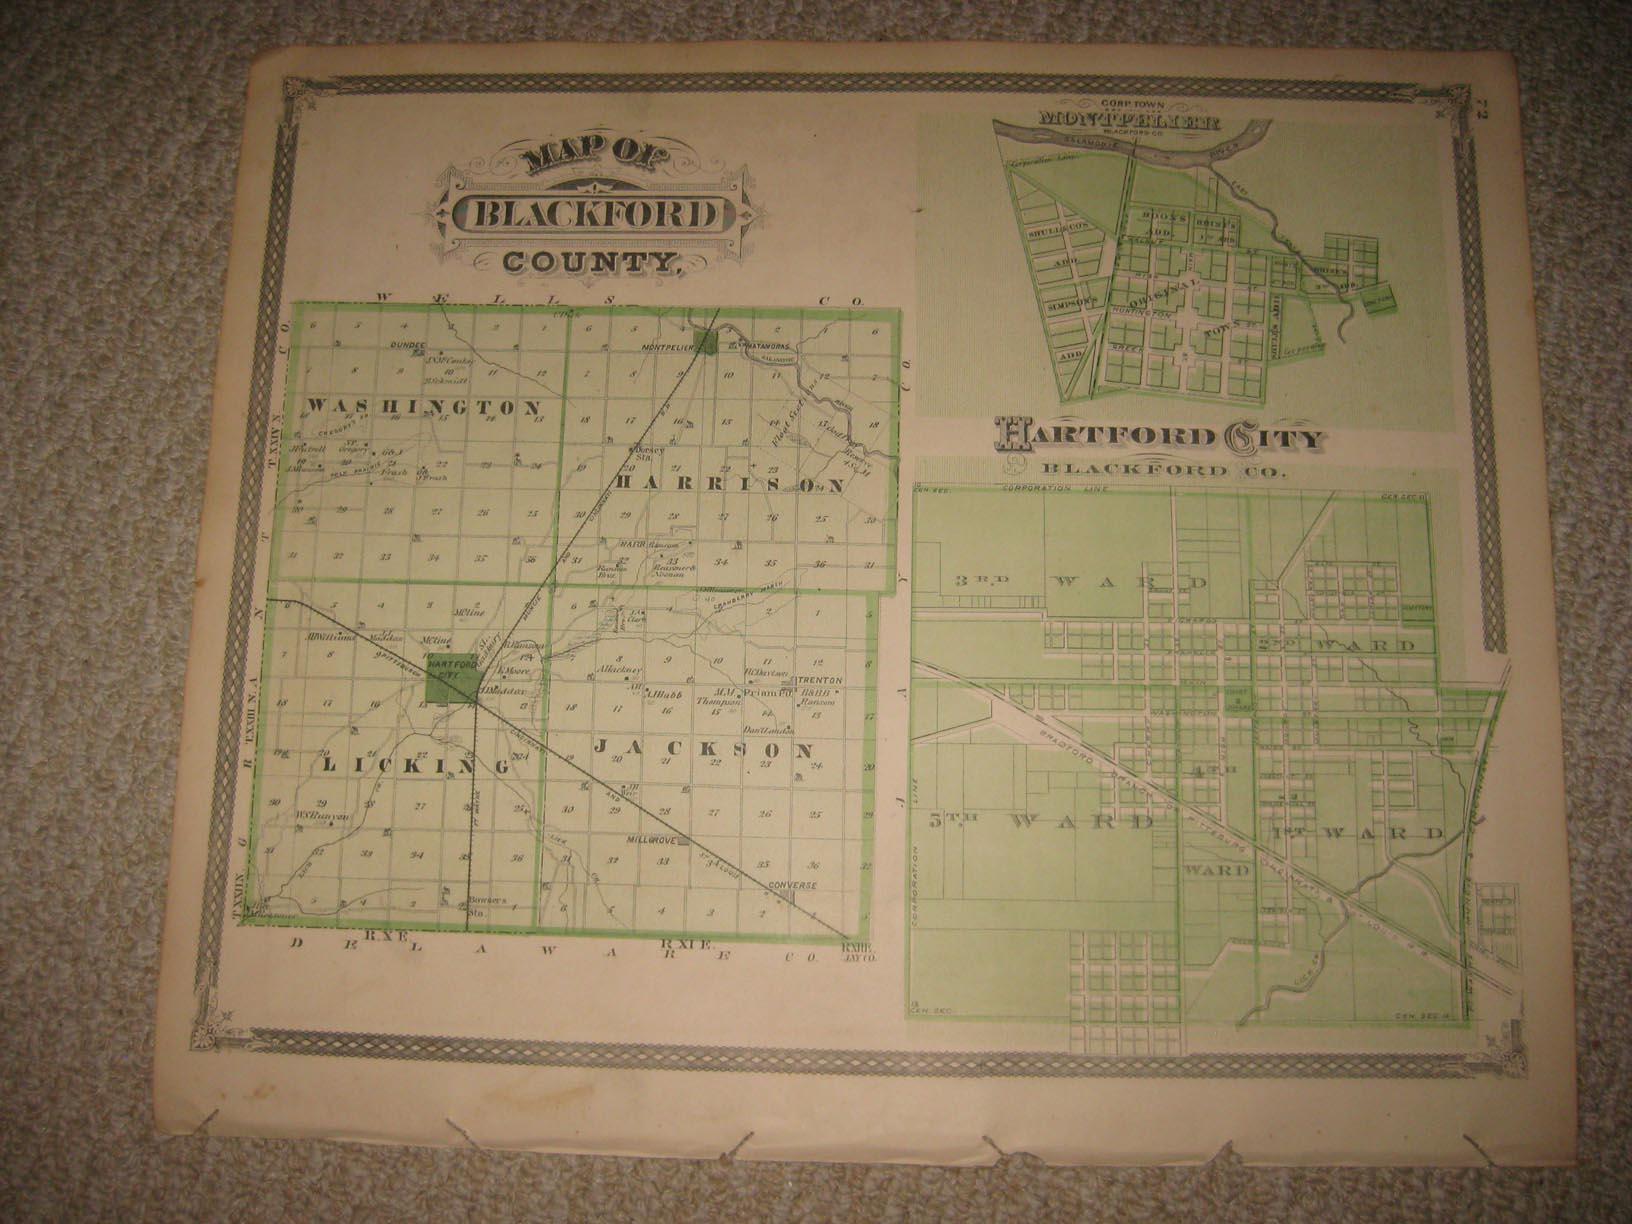 Fine Antique 1876 Blackford County Hartford City Montpelier Portland